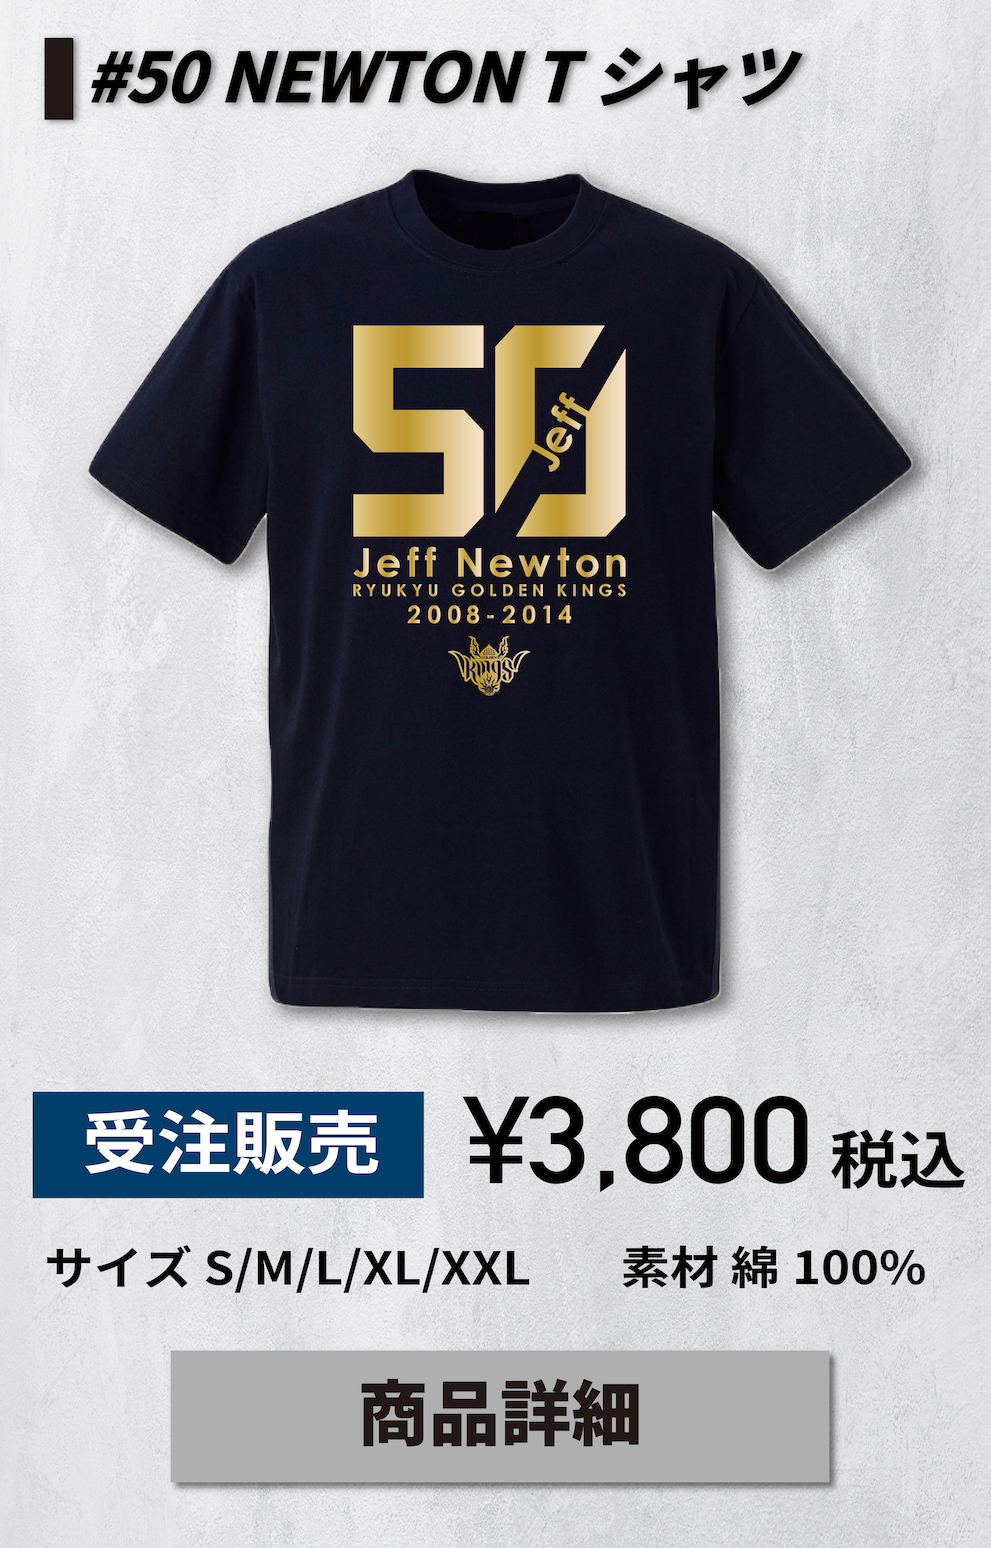 #50 NEWTON Tシャツ